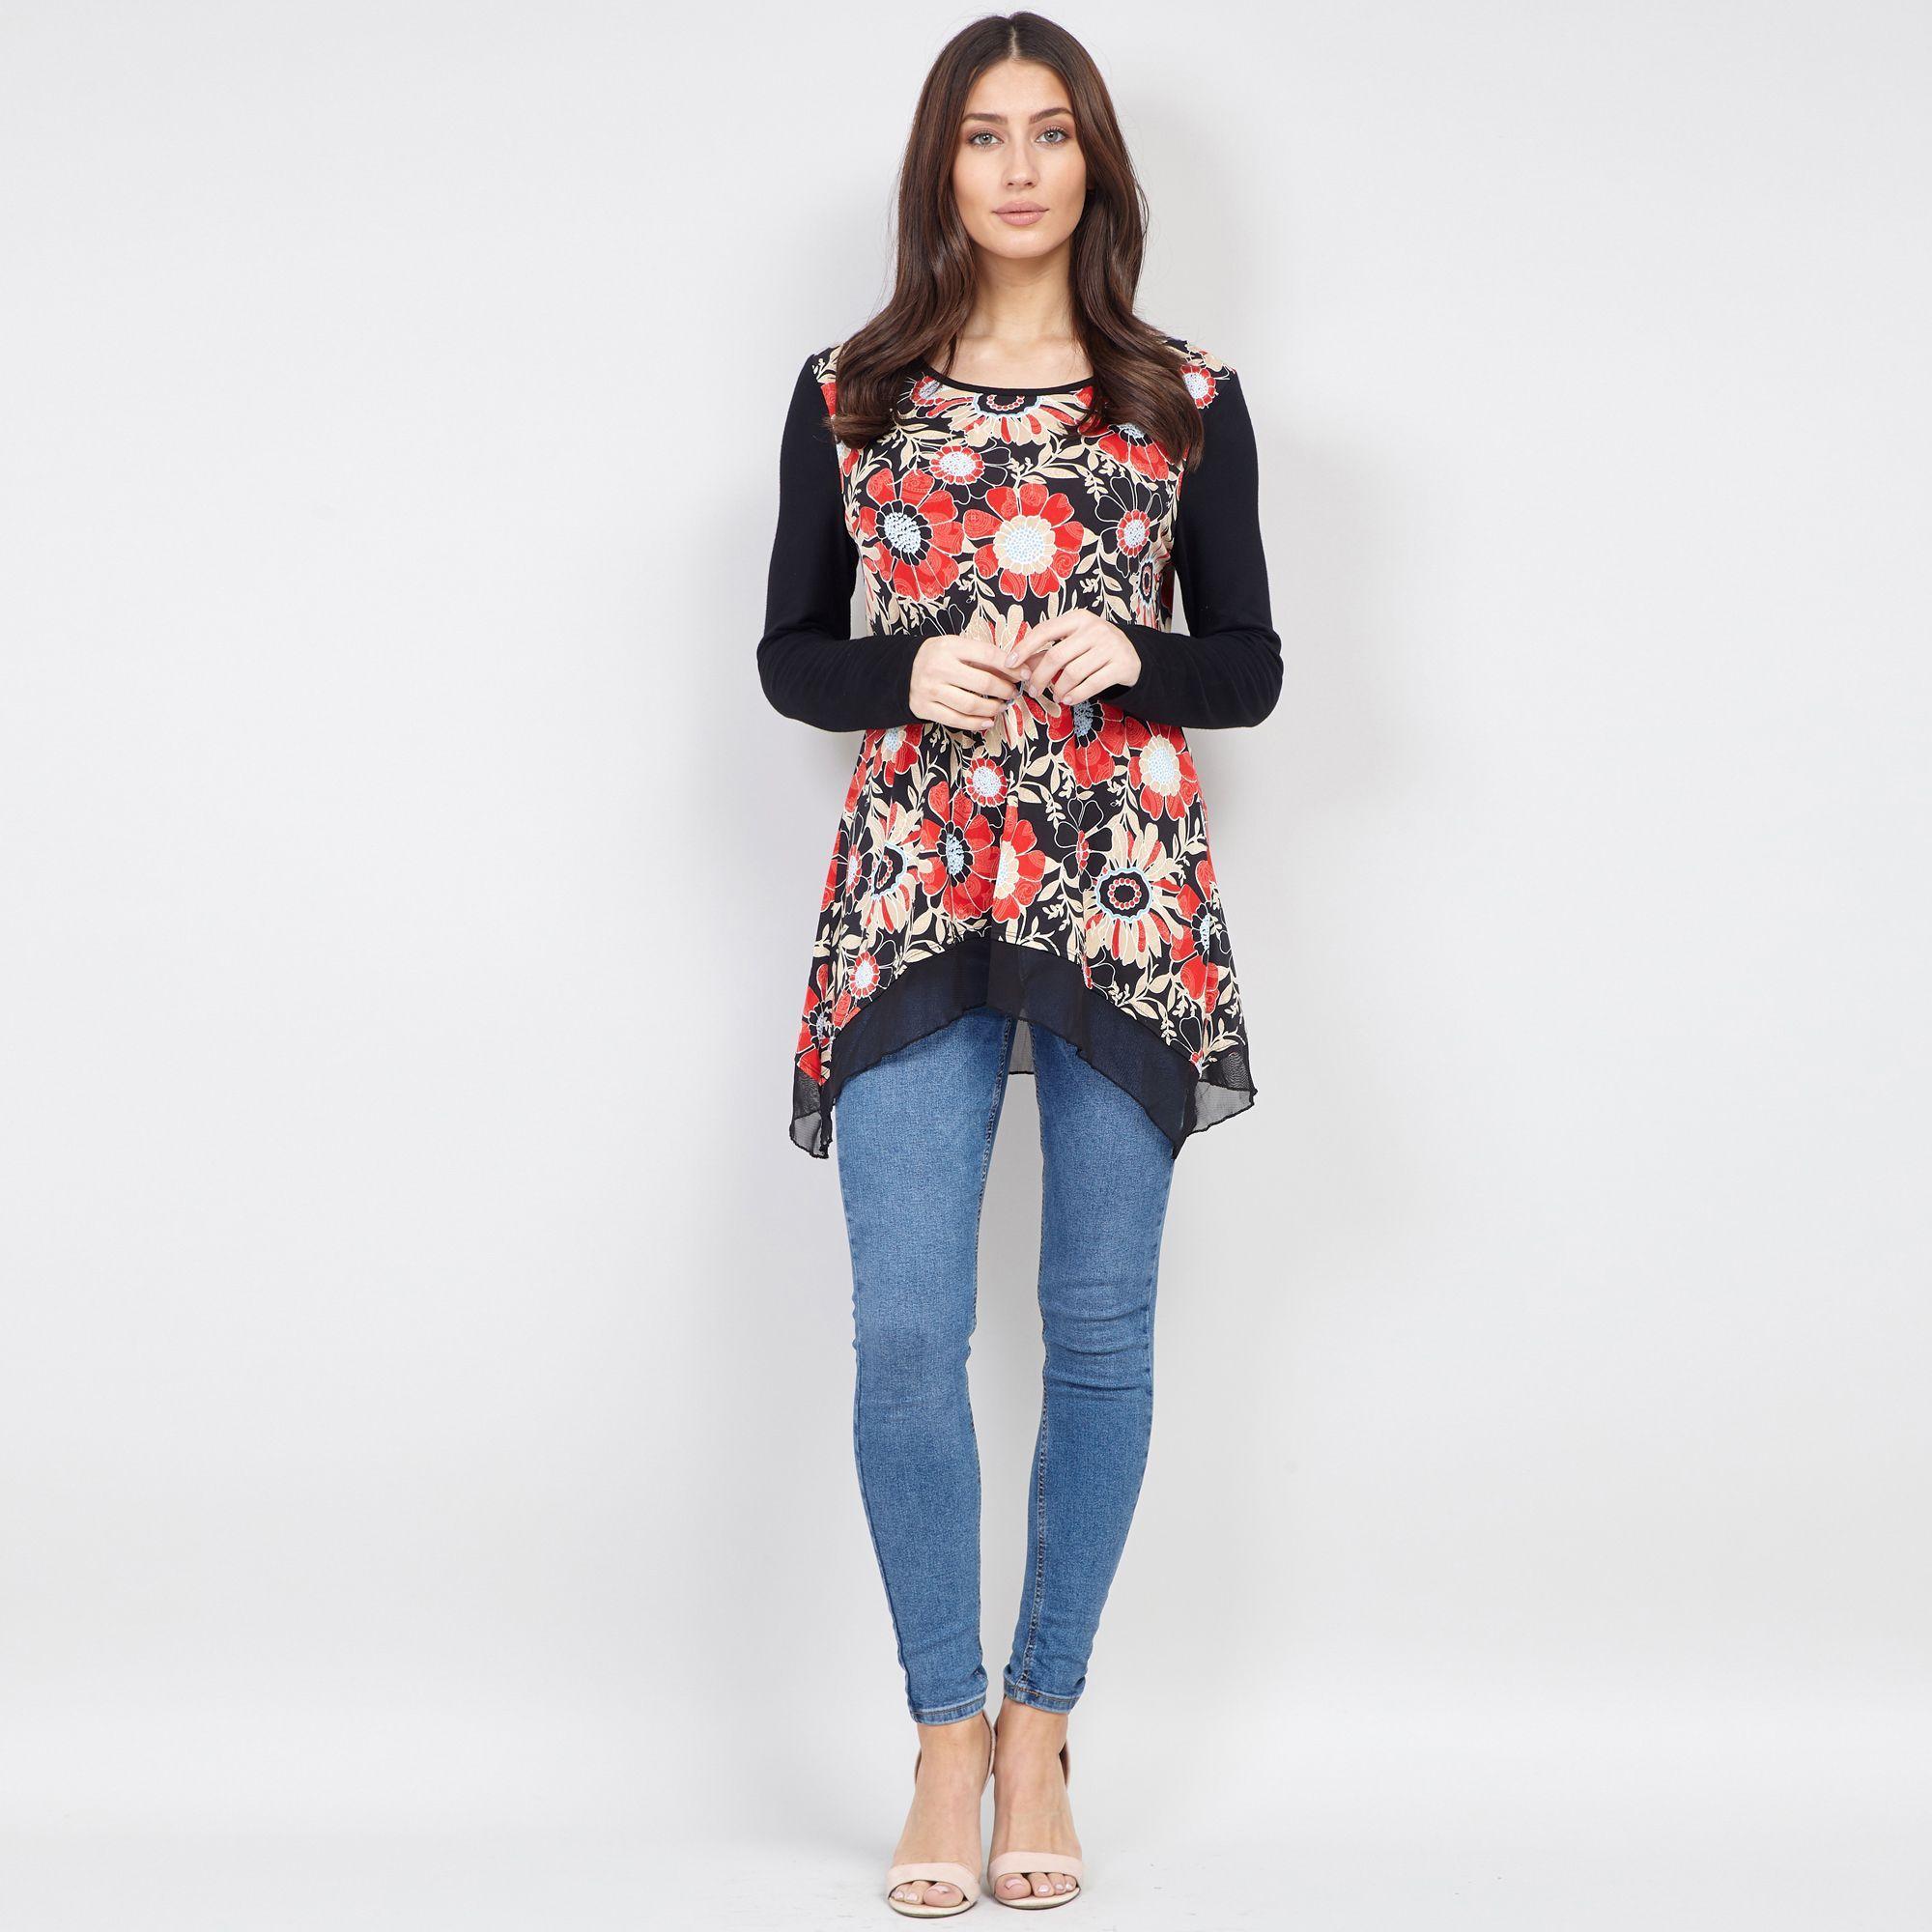 3a27c3a00aa Izabel London - Black Floral Print Tunic Top - Lyst. View fullscreen